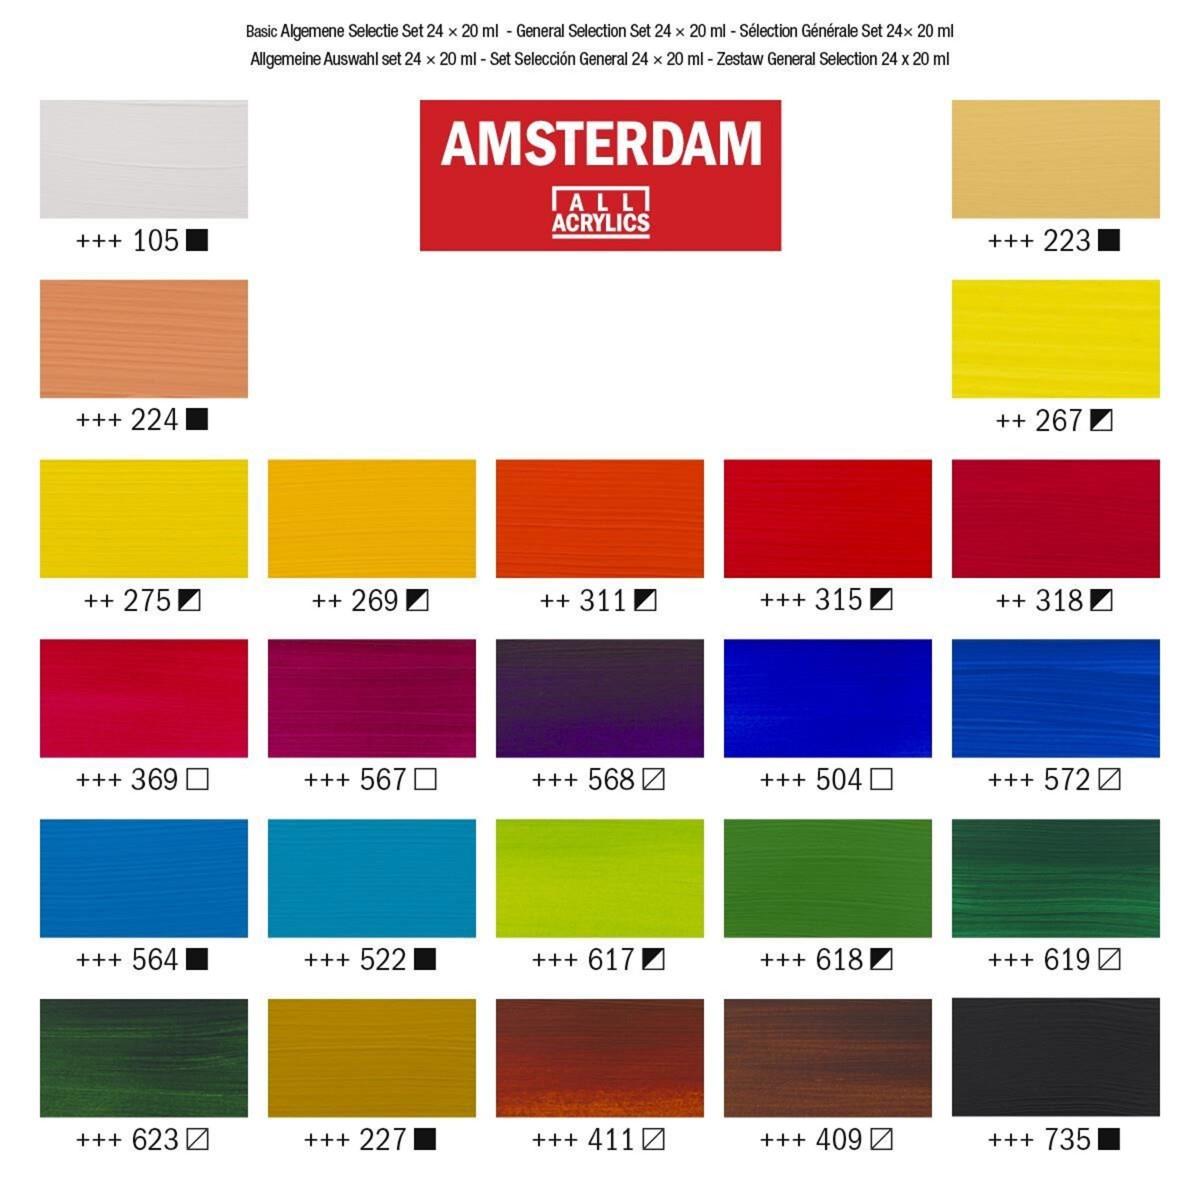 AmsterdamStandardstAkrylmaling20ml-08